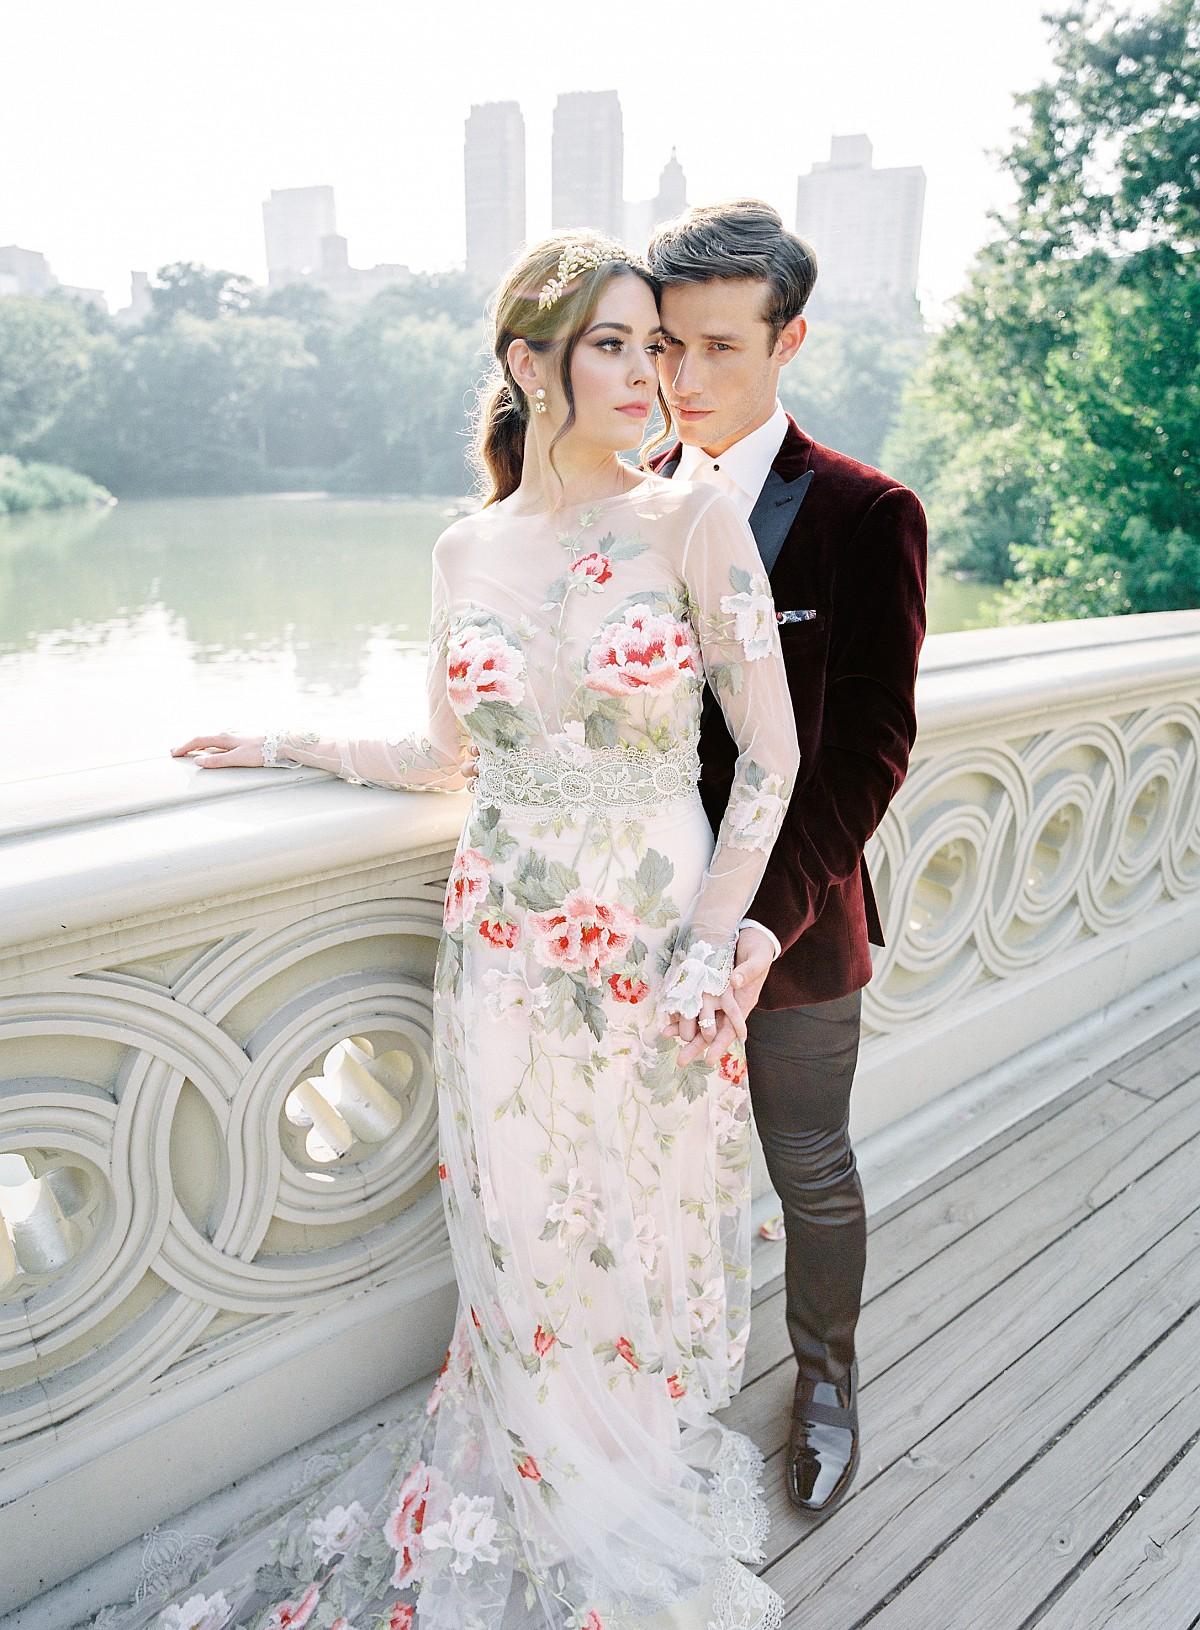 Claire Pettibone floral wedding dress